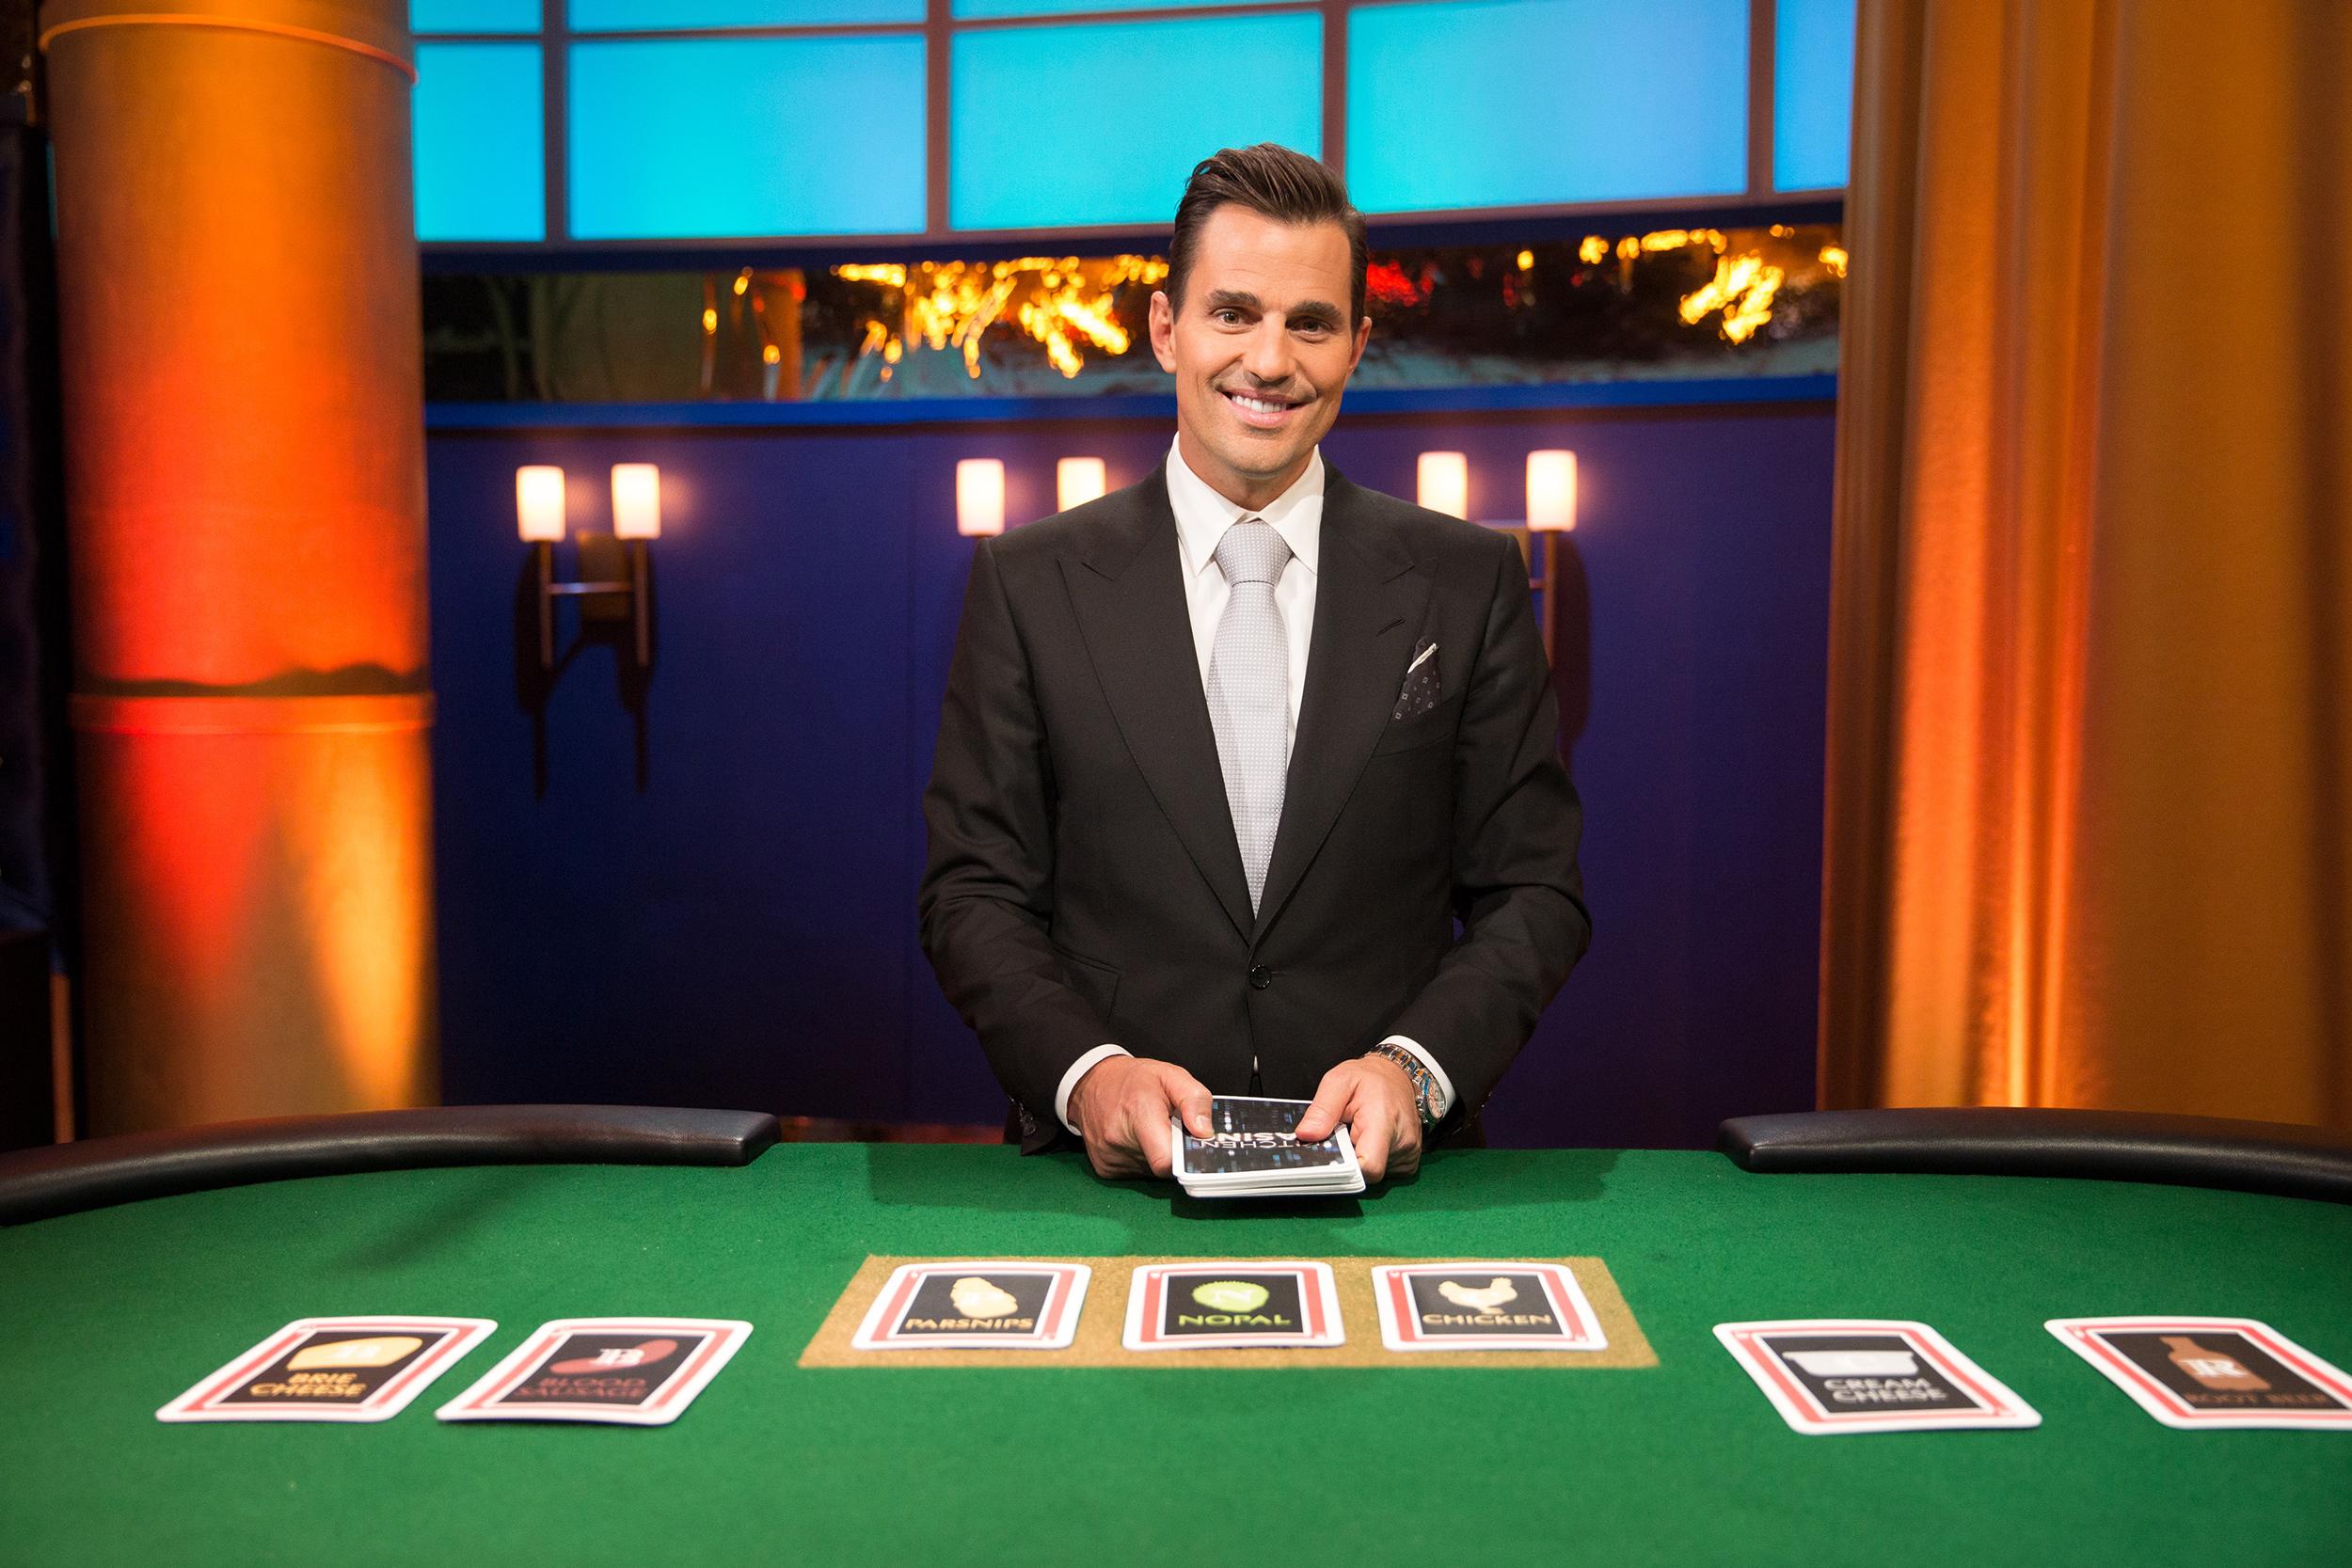 $50 bill indian casino bingo casino slot